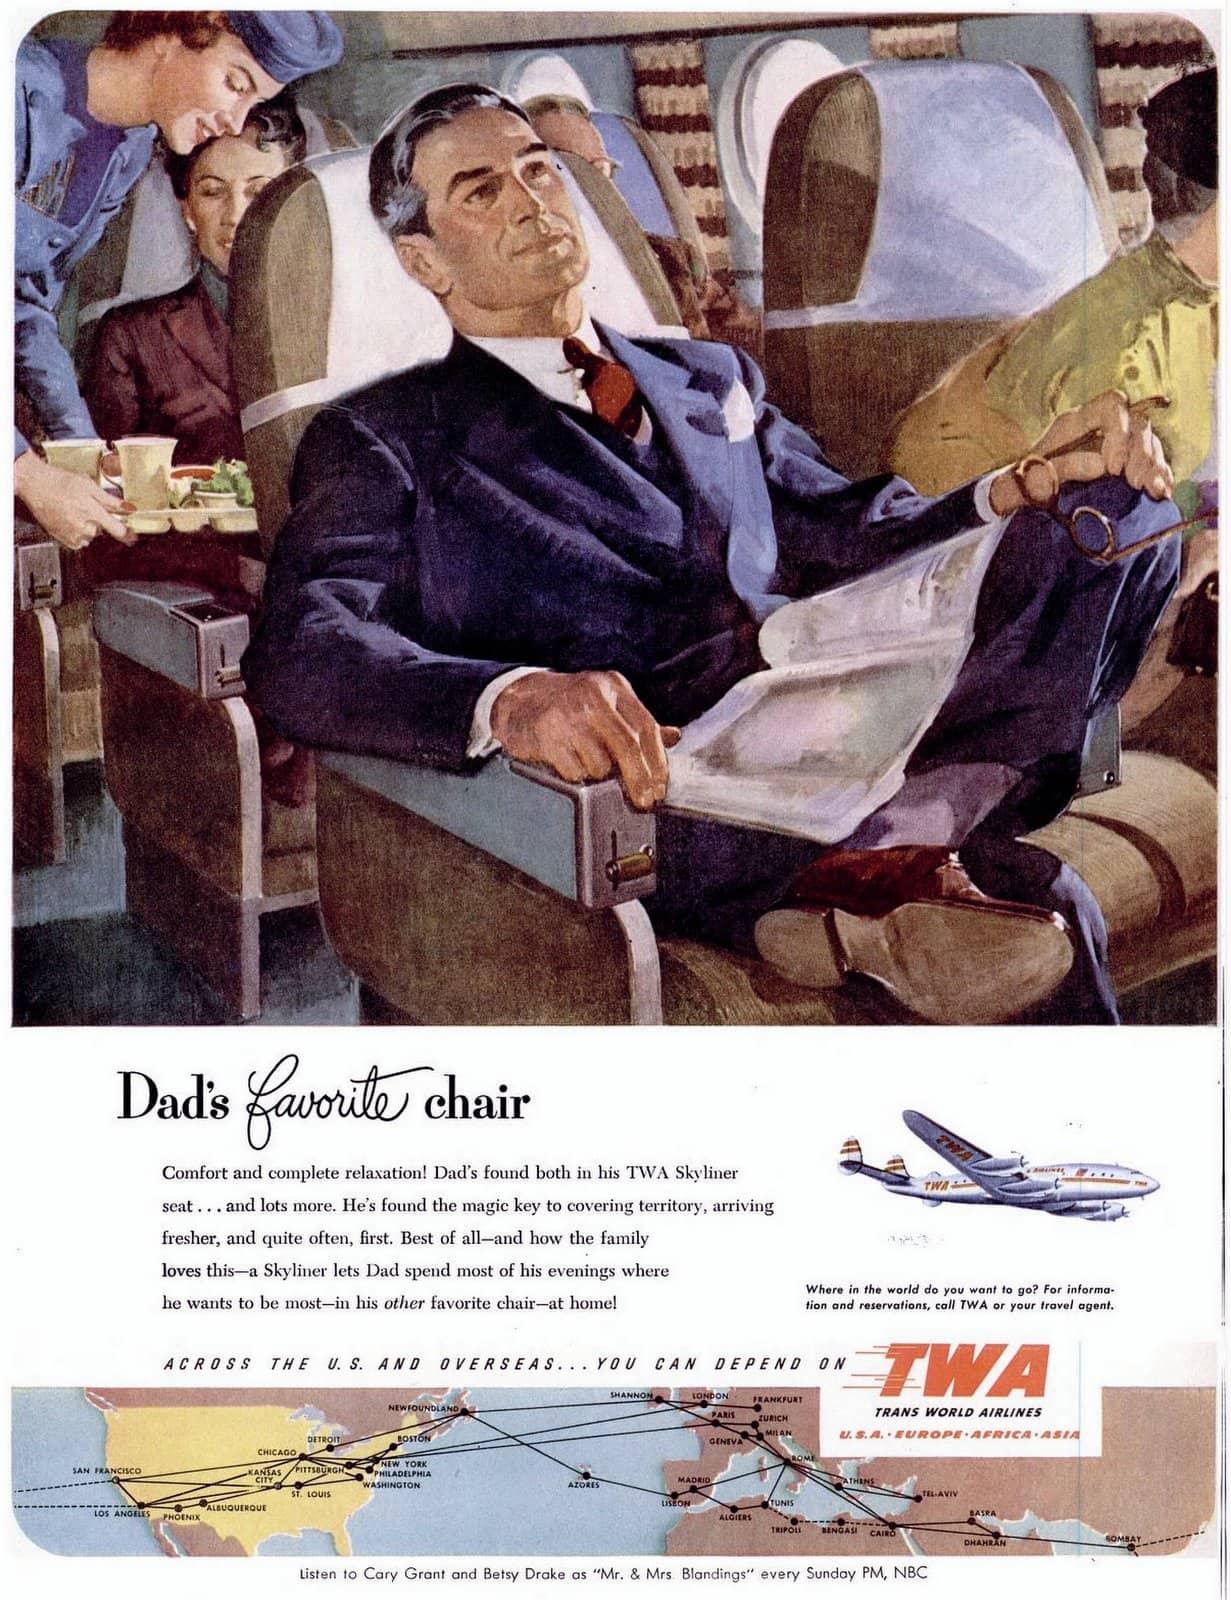 Flying TWA airplane - Dad's favorite chair (1951)